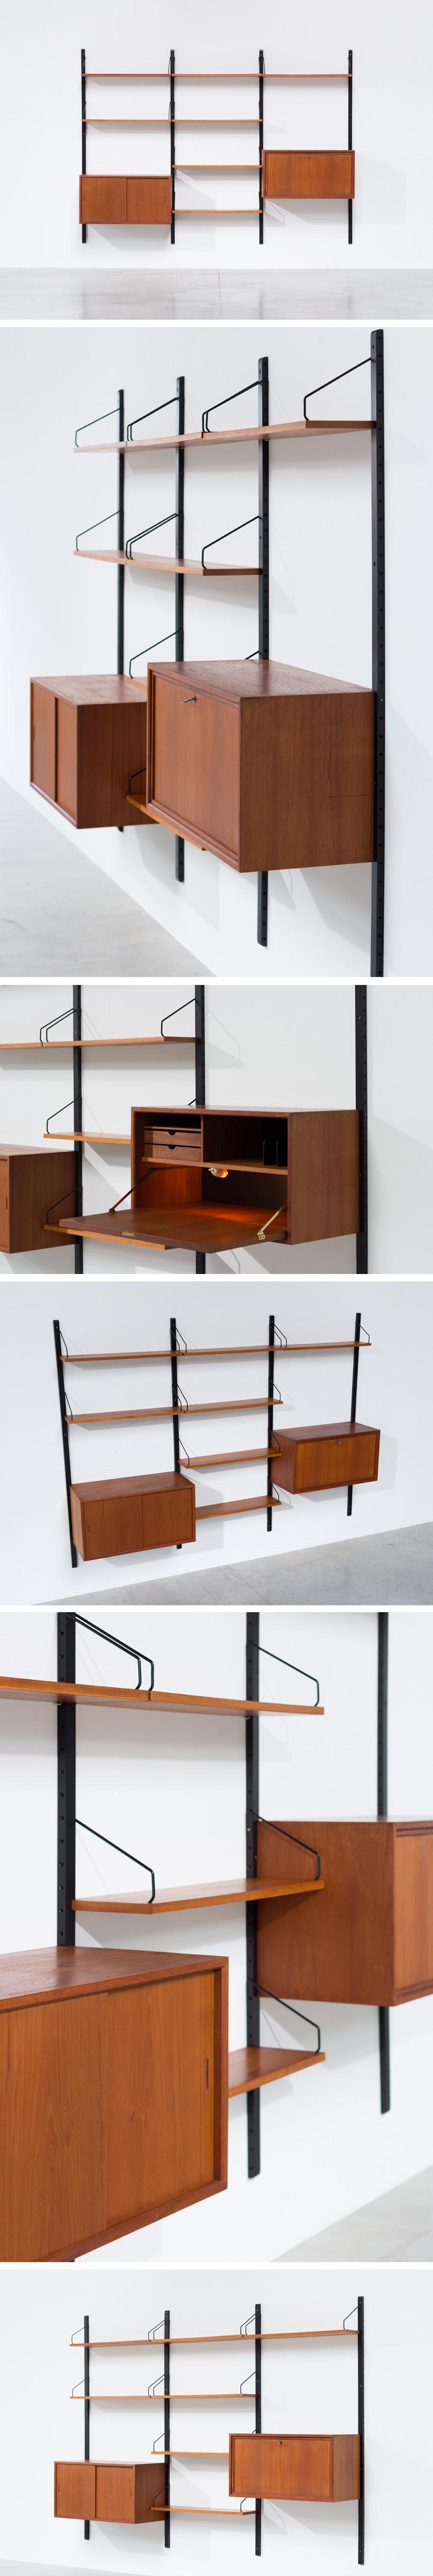 Poul Cadovius Teak Wall Unit with desk Royal System Large